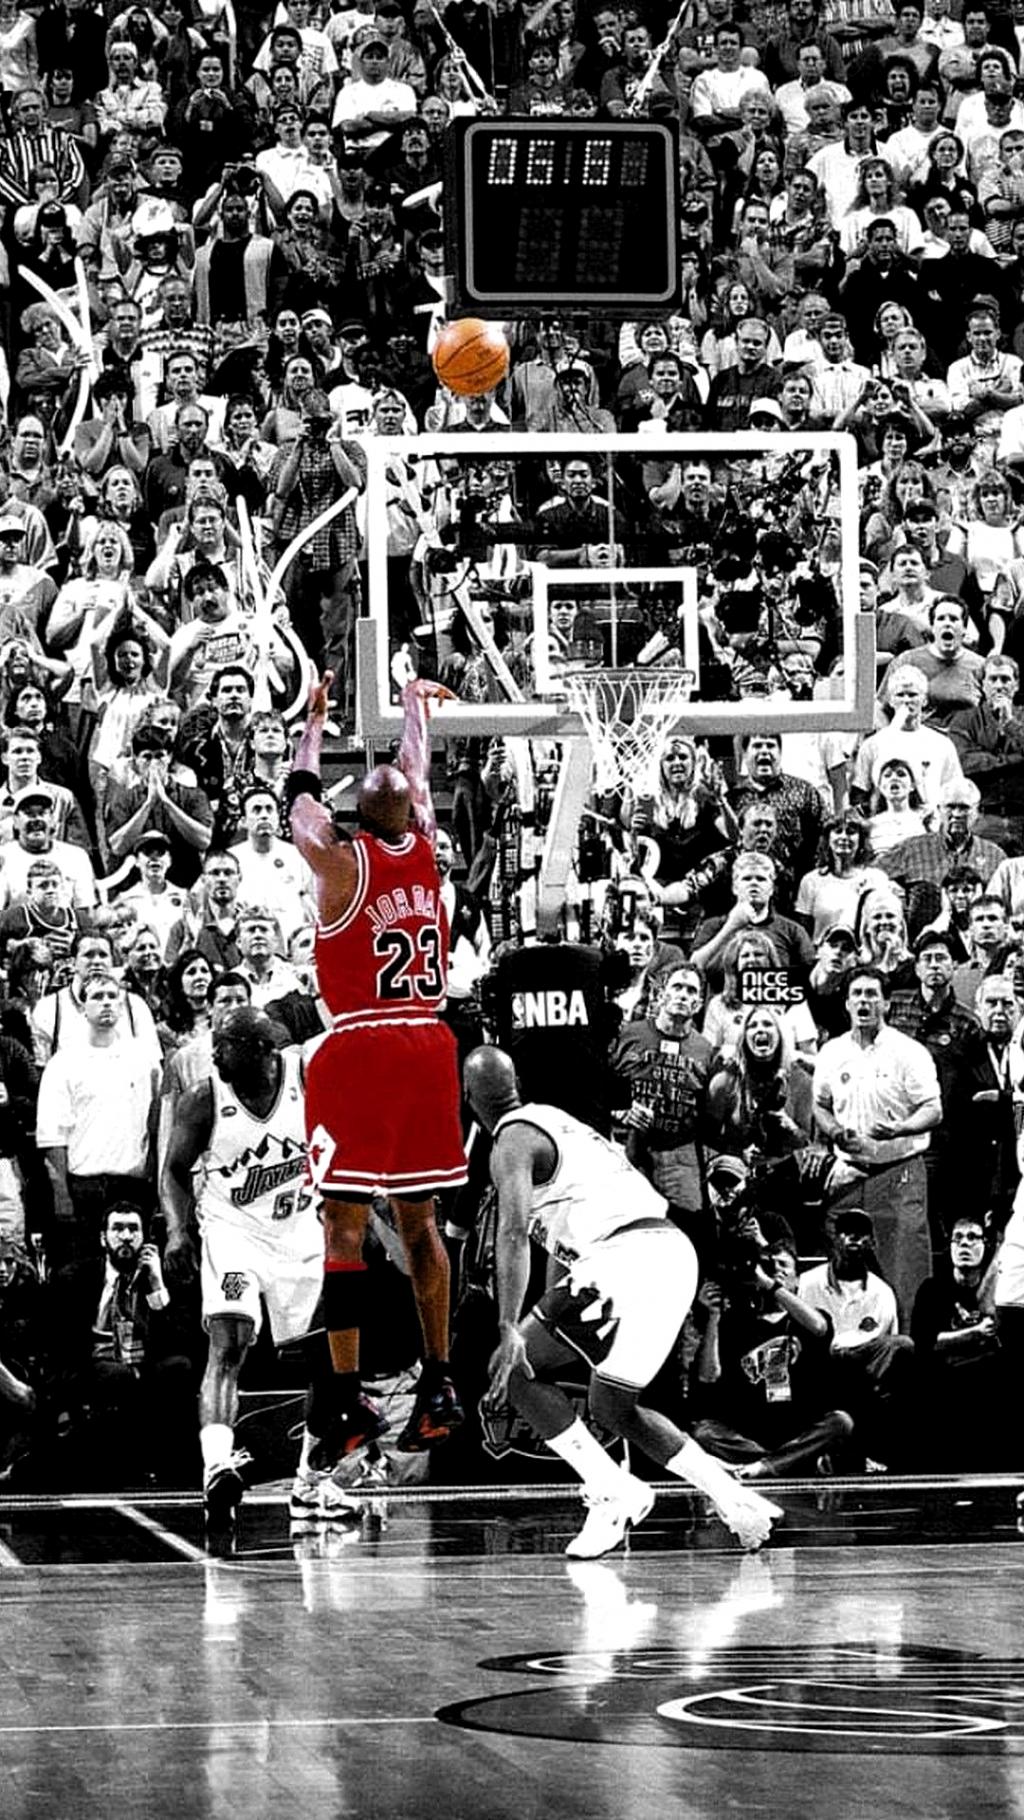 NBA iPhone 6 Wallpaper - Best Wallpaper HD in 2020 ...